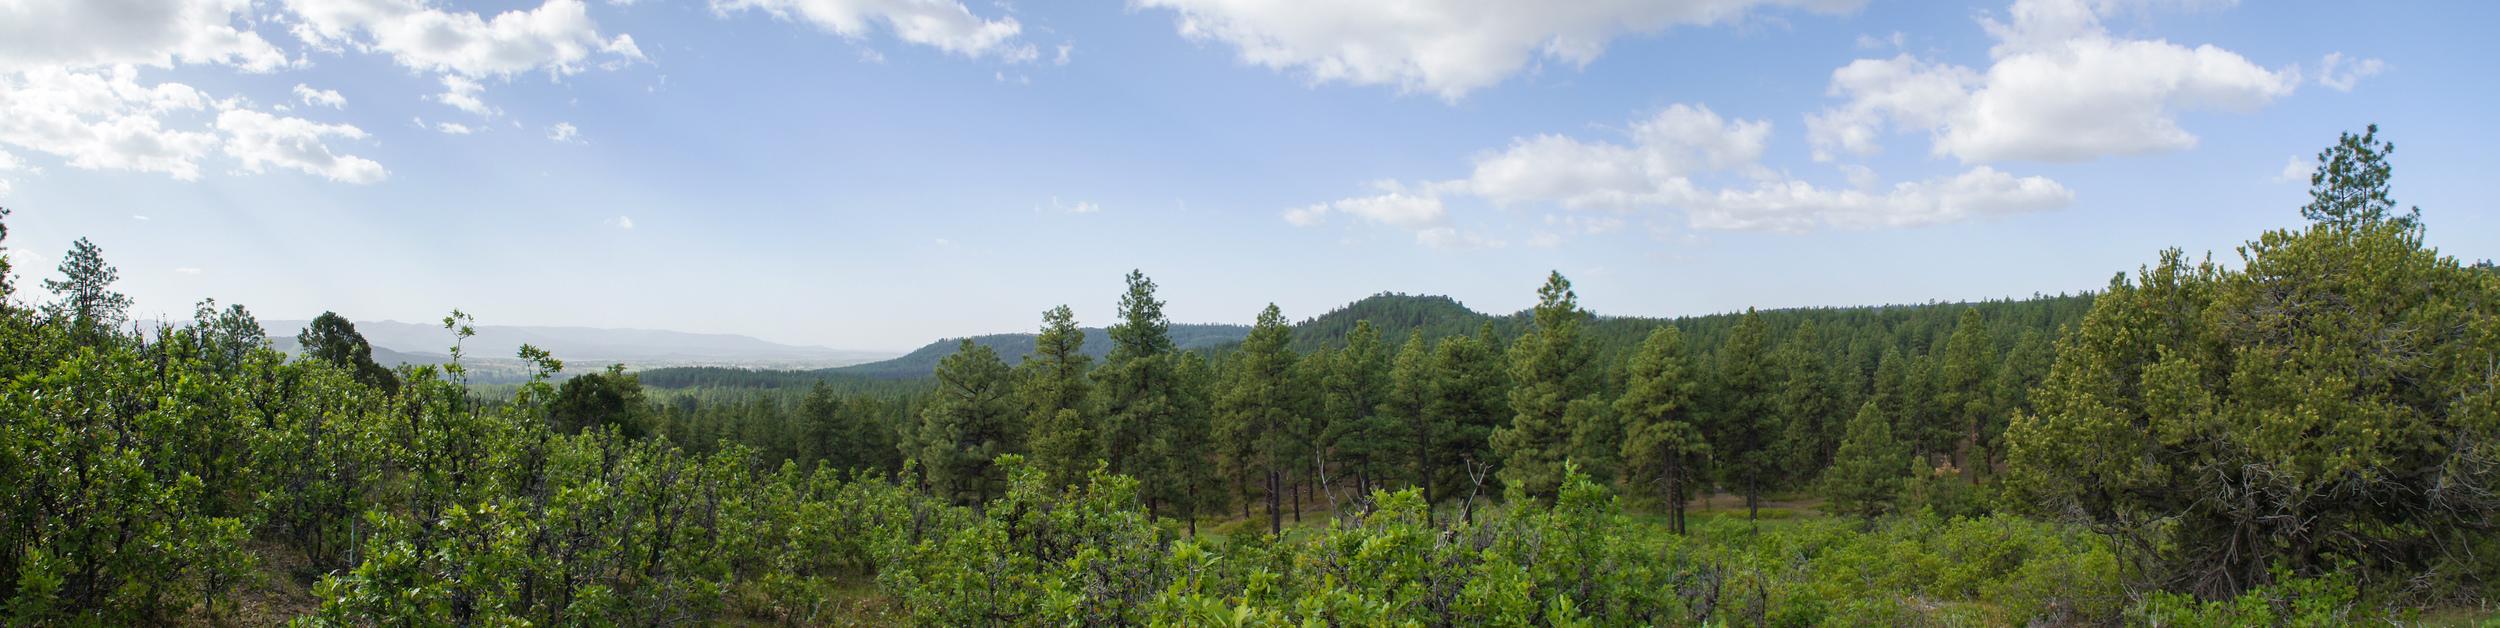 Pano - Eagles Ridge - 2117-23.jpg